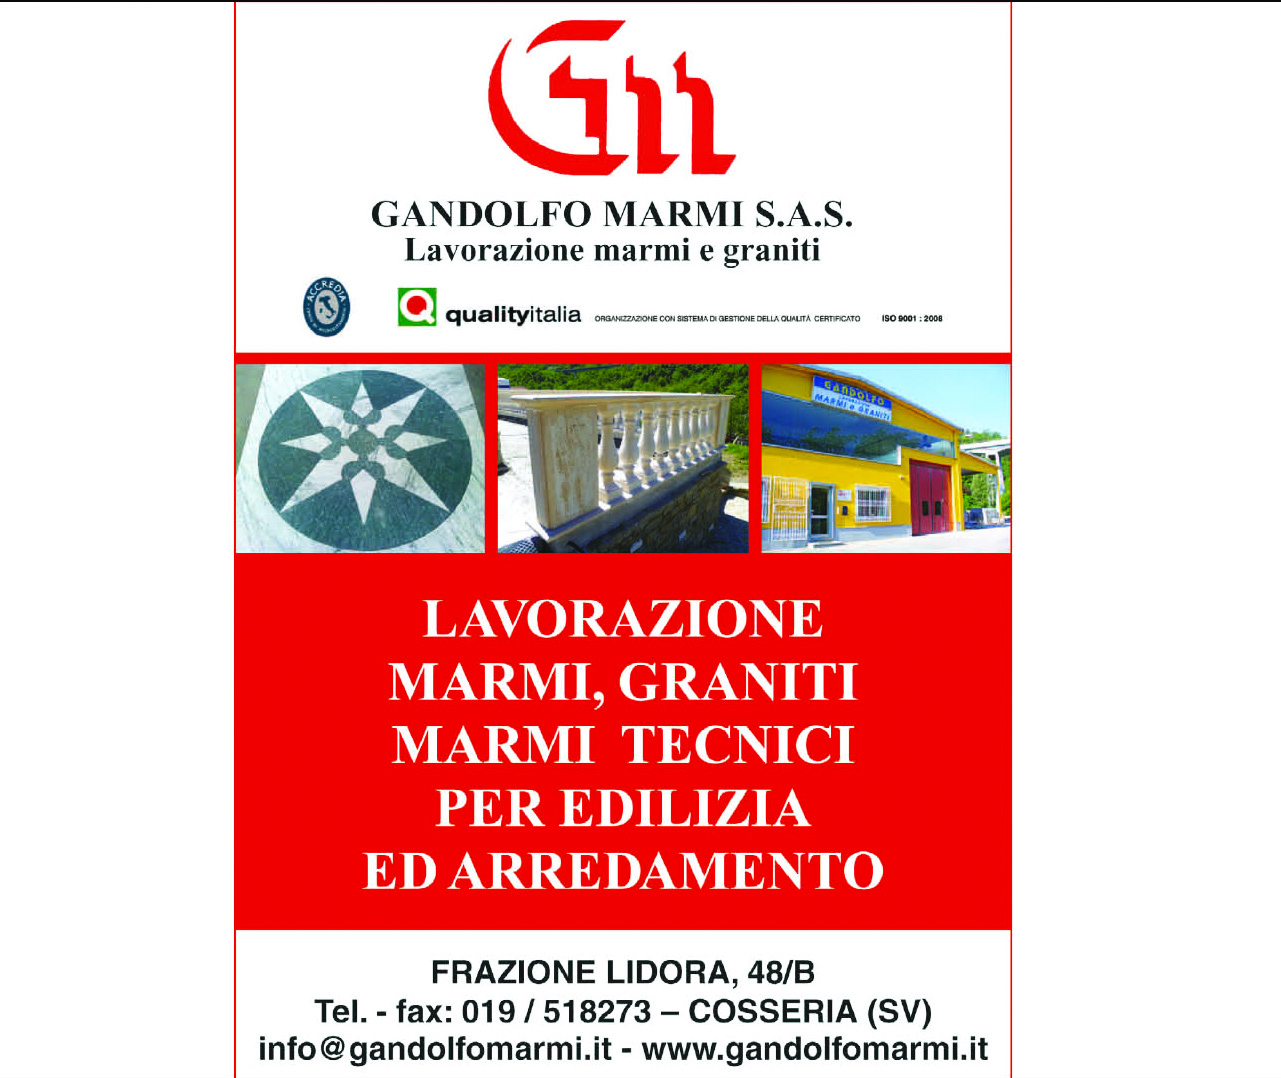 gandolfo_marmi.jpg